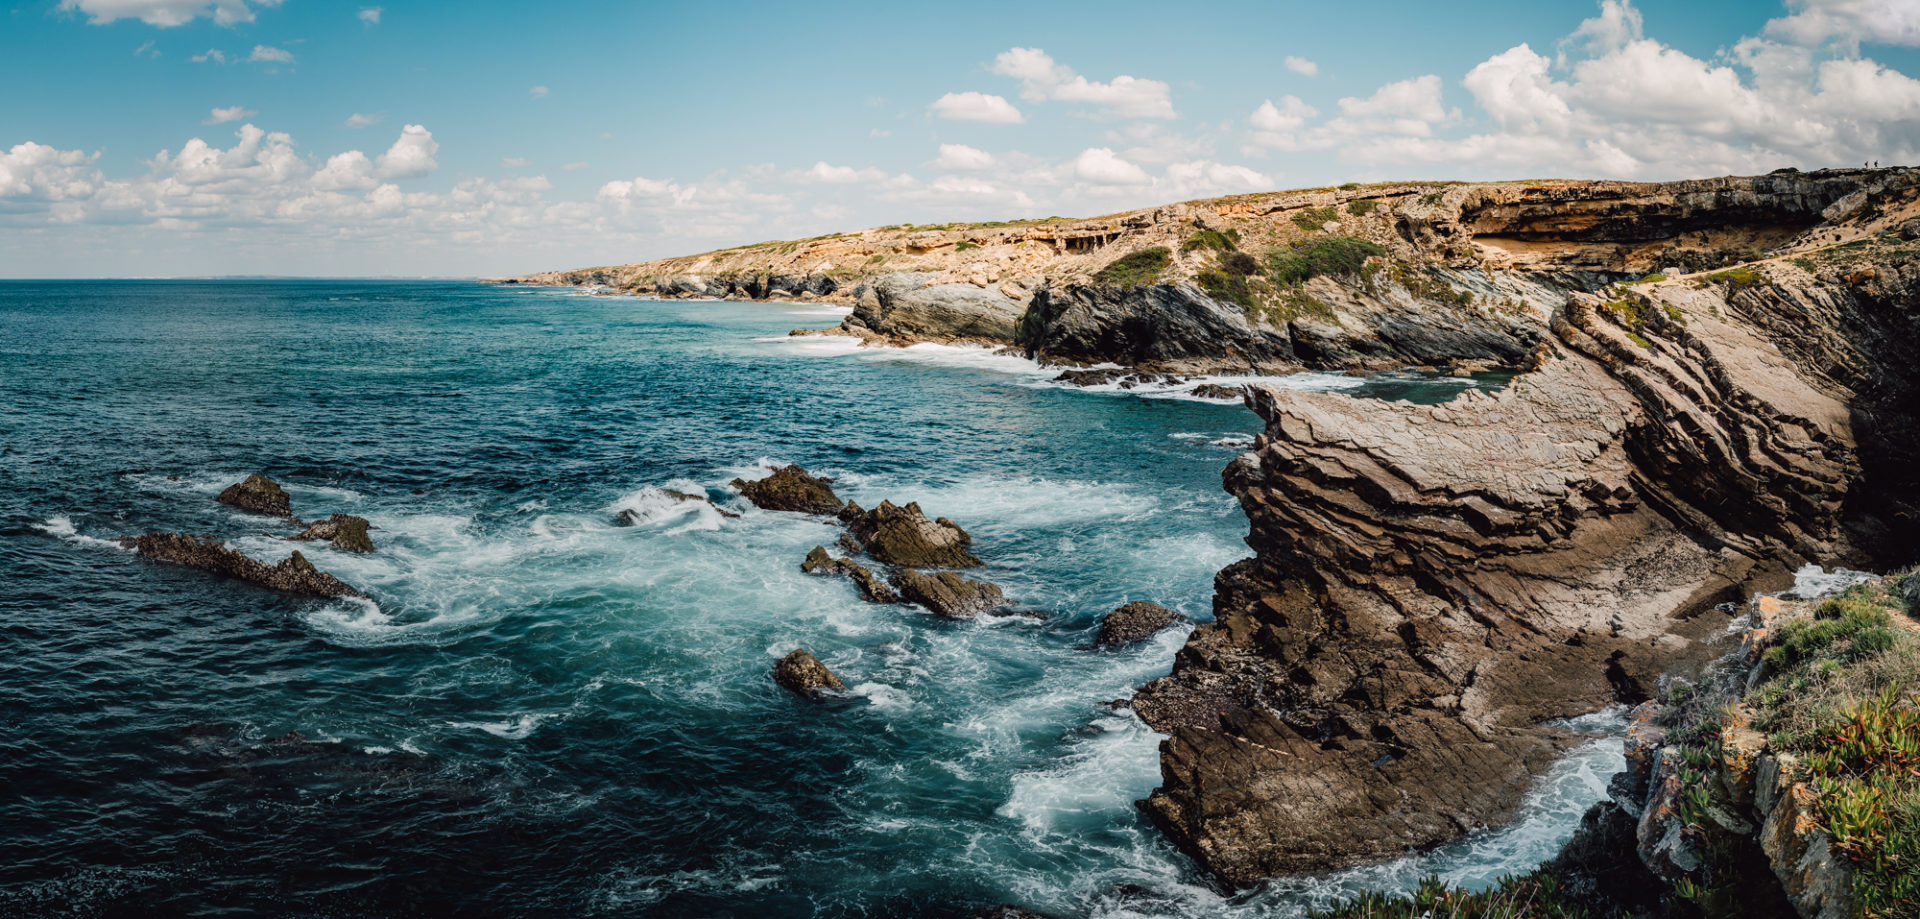 Atlantikküste in Portugal